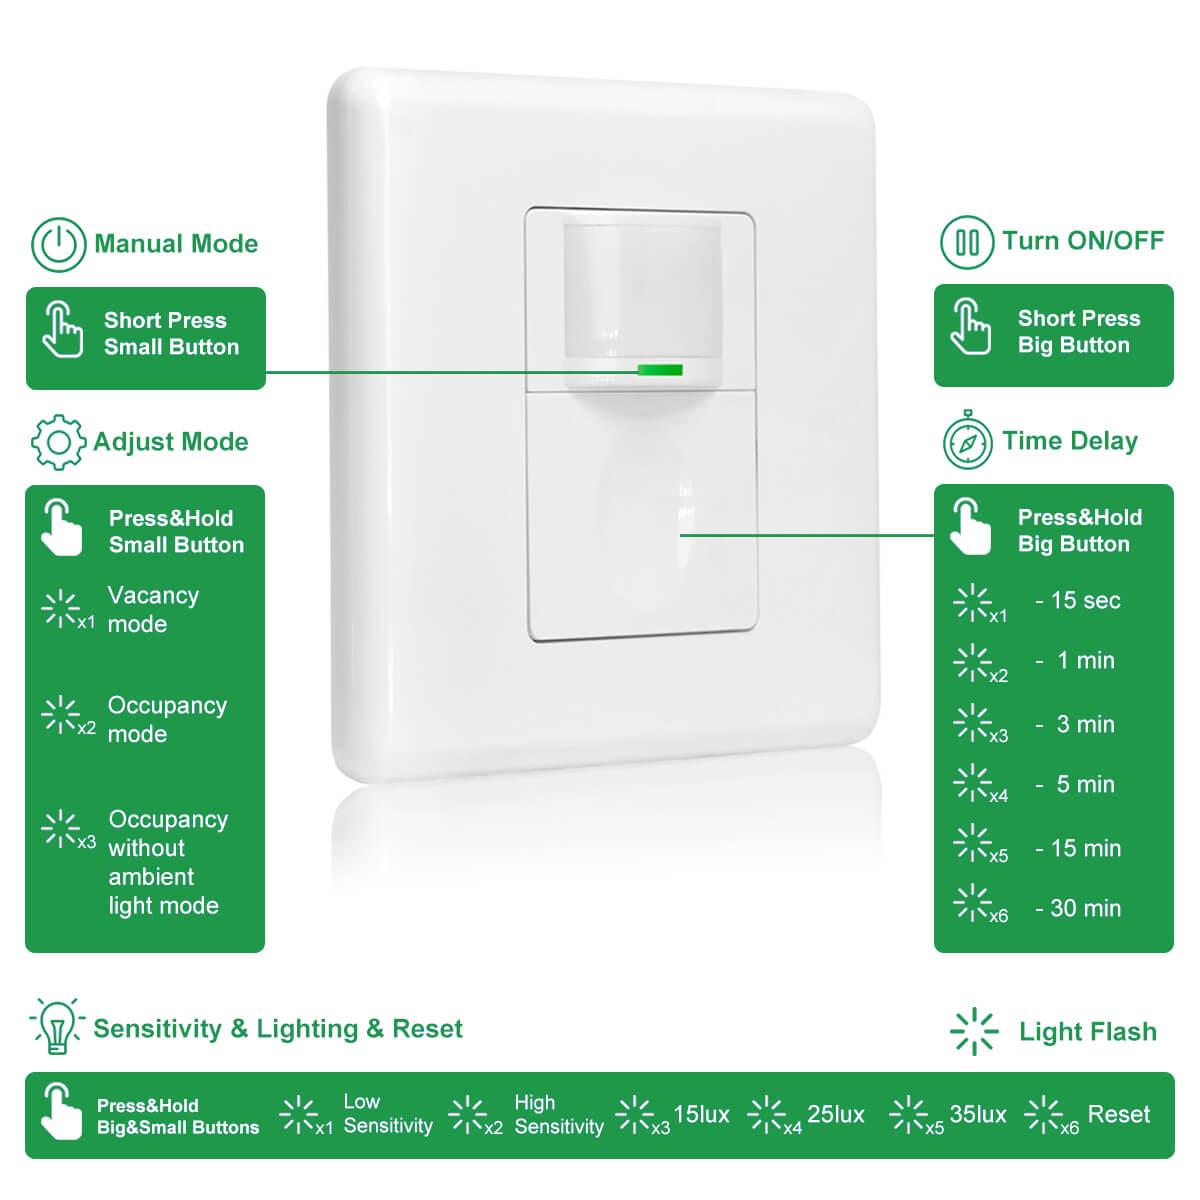 rz022 motion sensor switch manual instruction